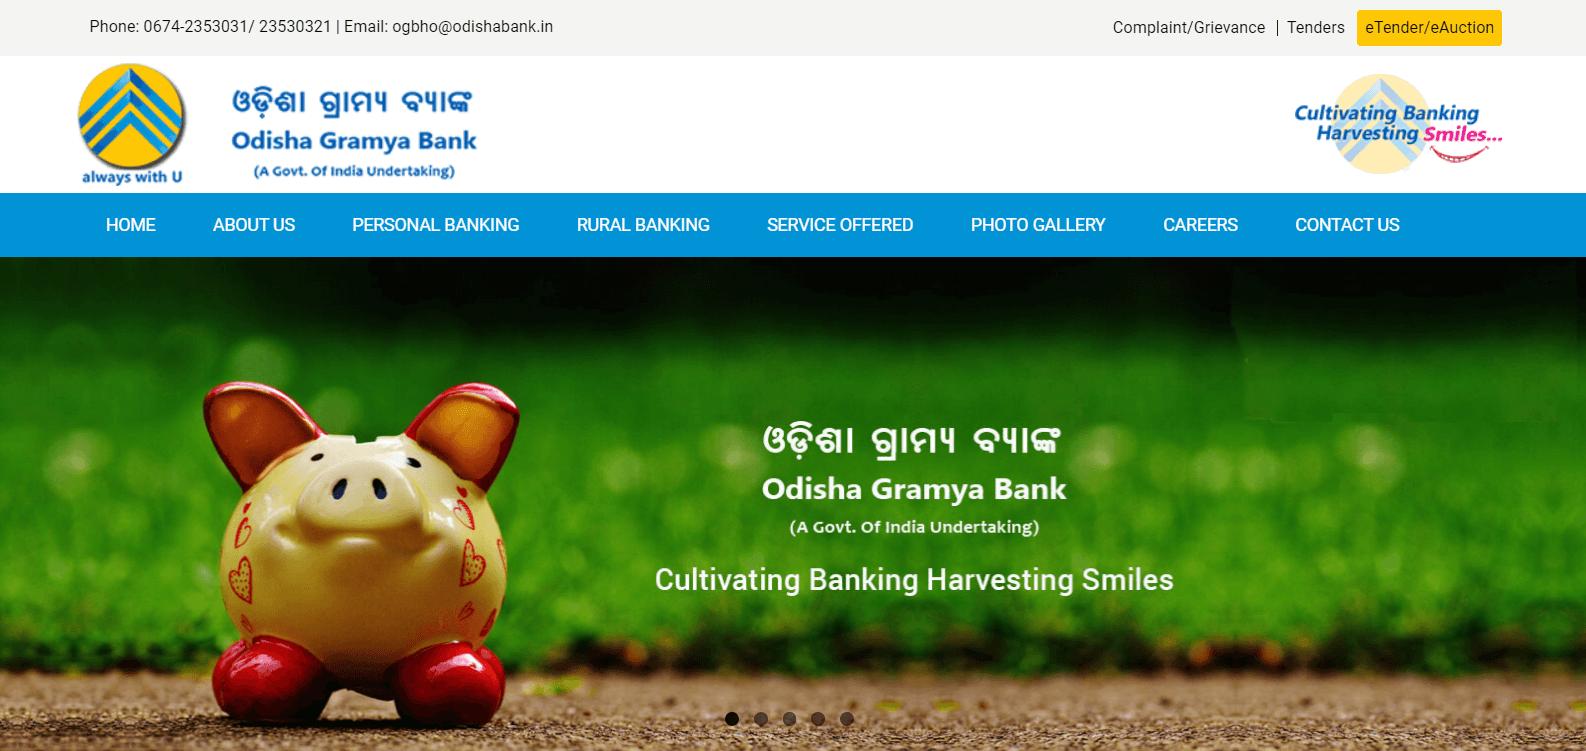 Odisha Gramya Bank Missed call balance enquiry number